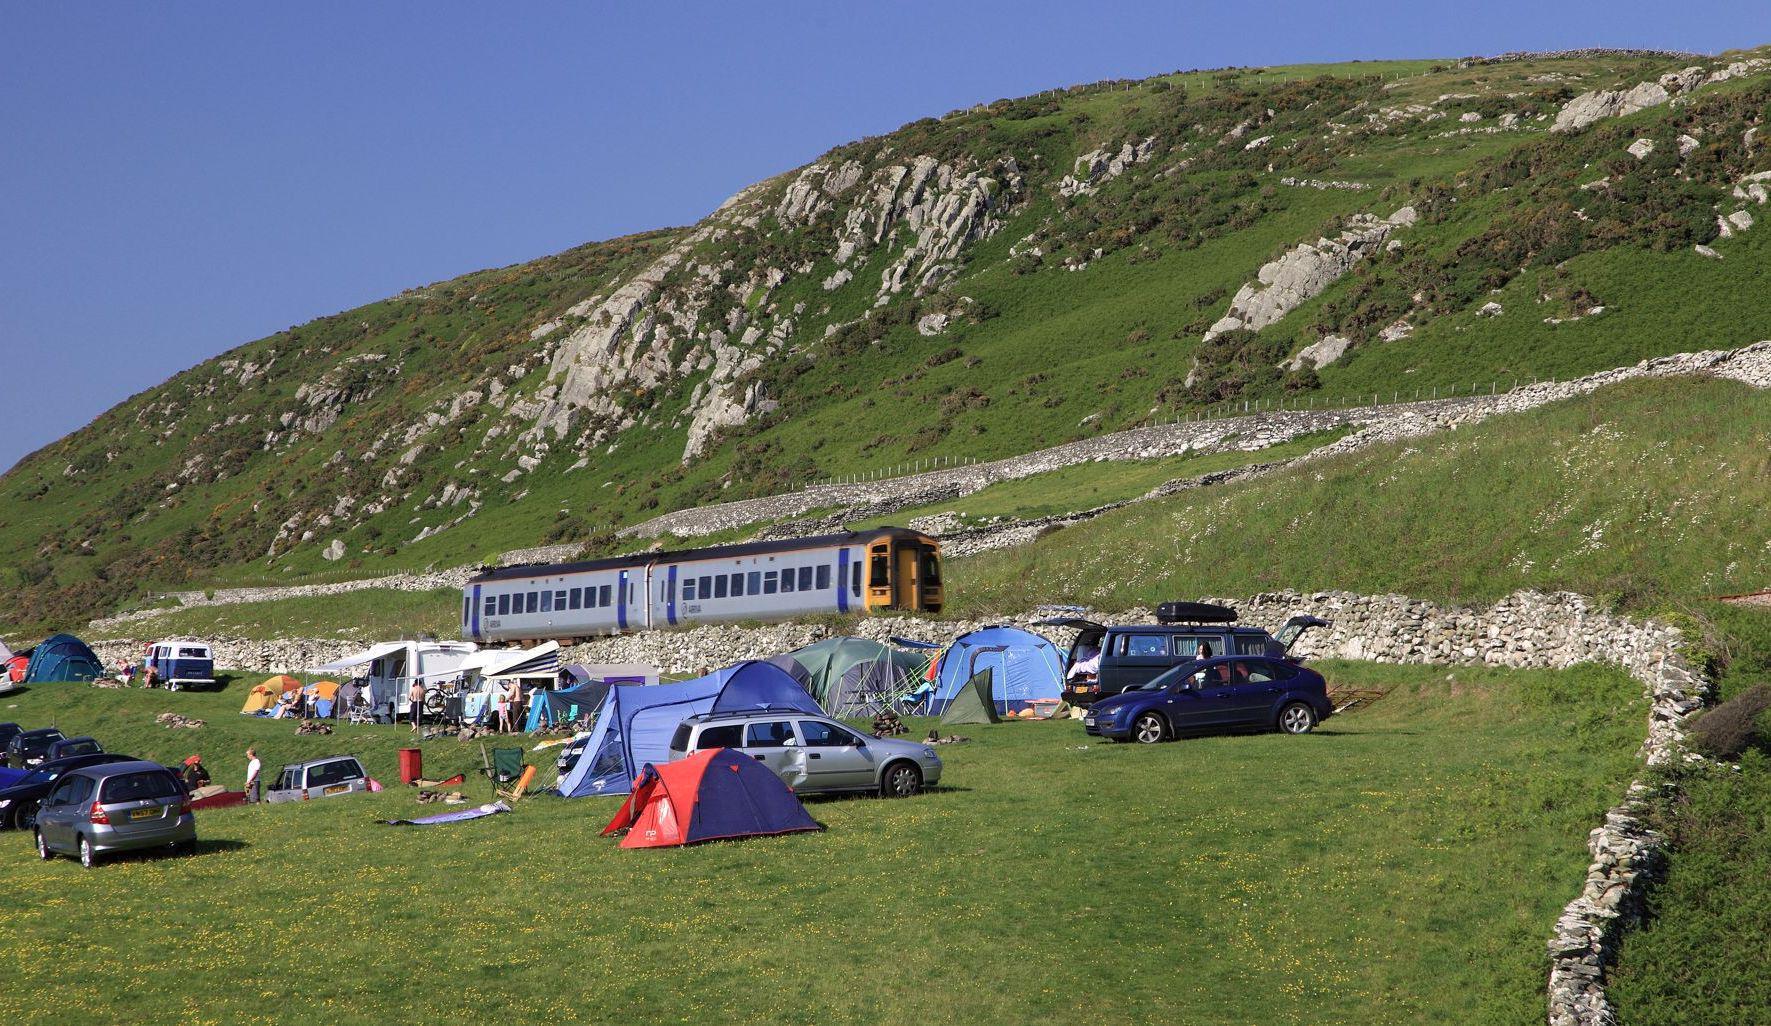 Tywyn Camping | Campsites in Tywyn, West Wales